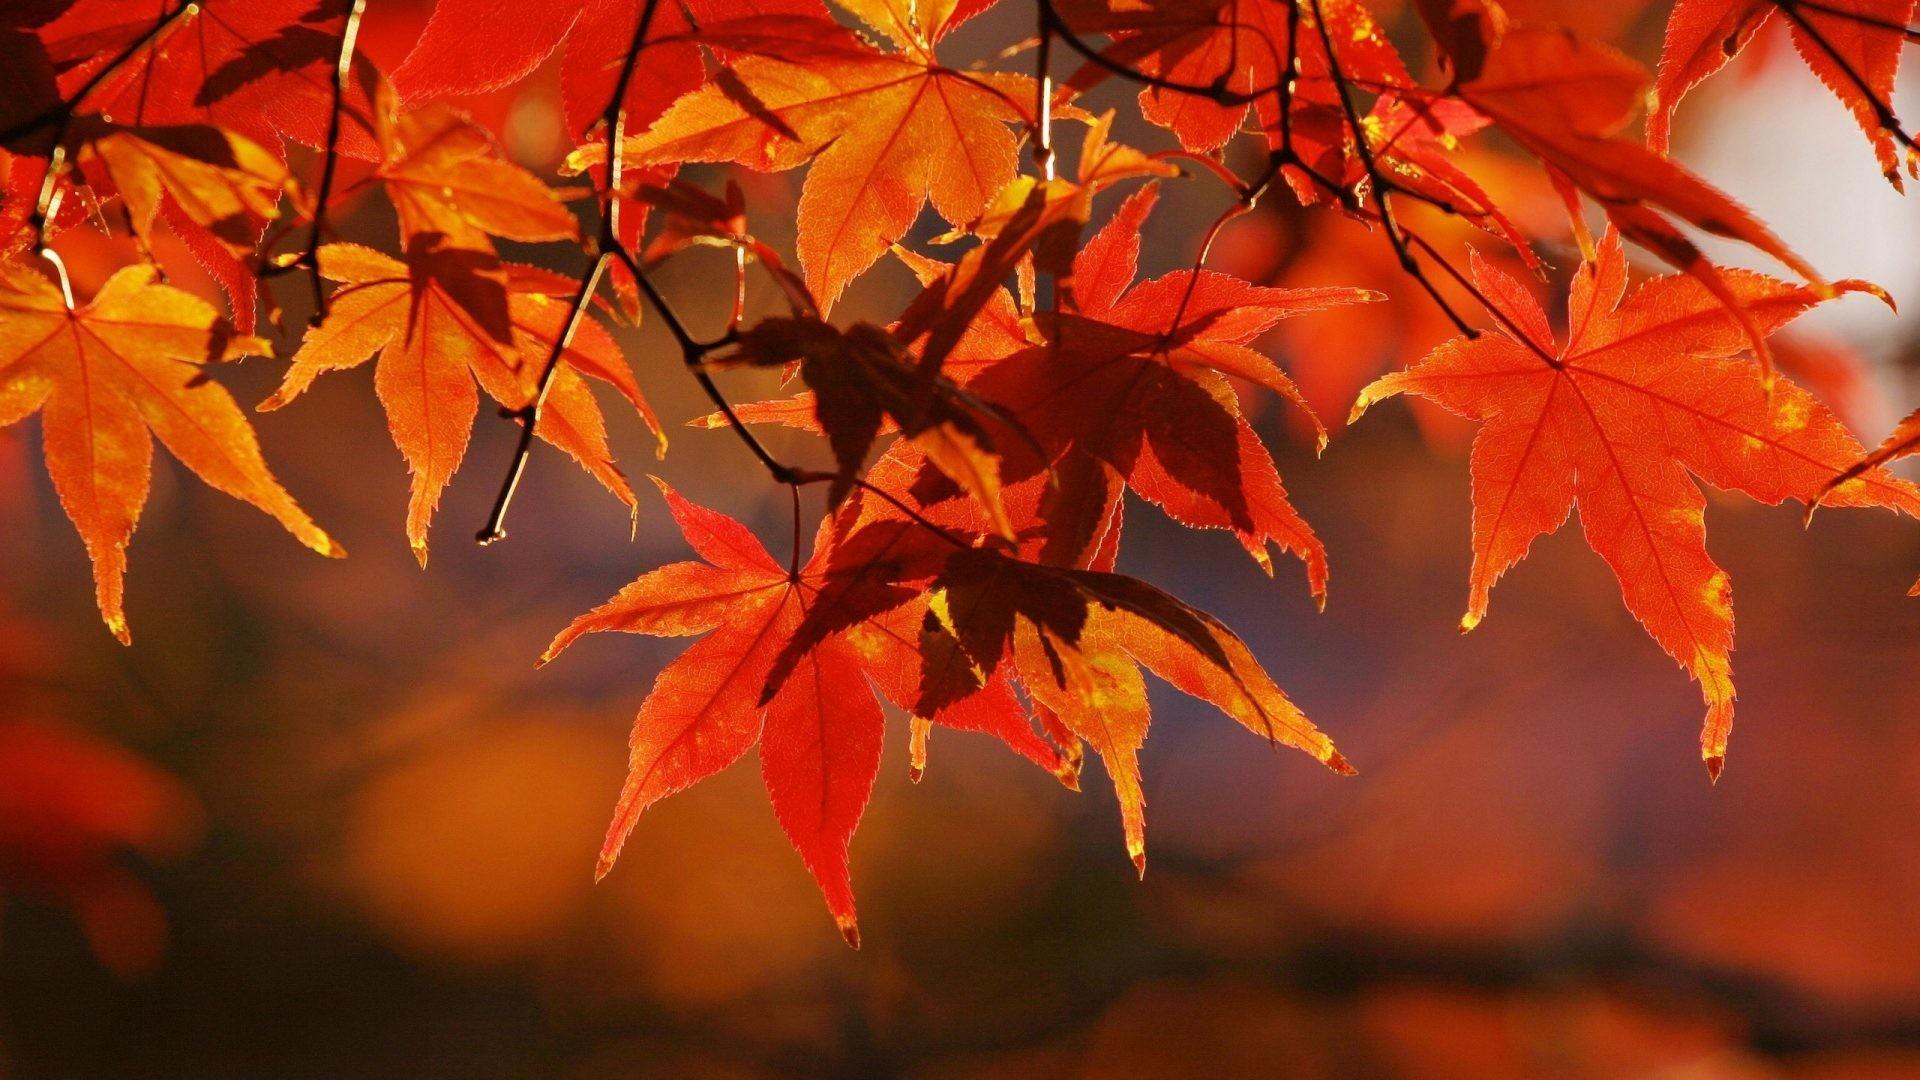 Leaves Tag – Fall Leaves Season Autumn Colors Tree Free Desktop Wallpaper  for HD 16: